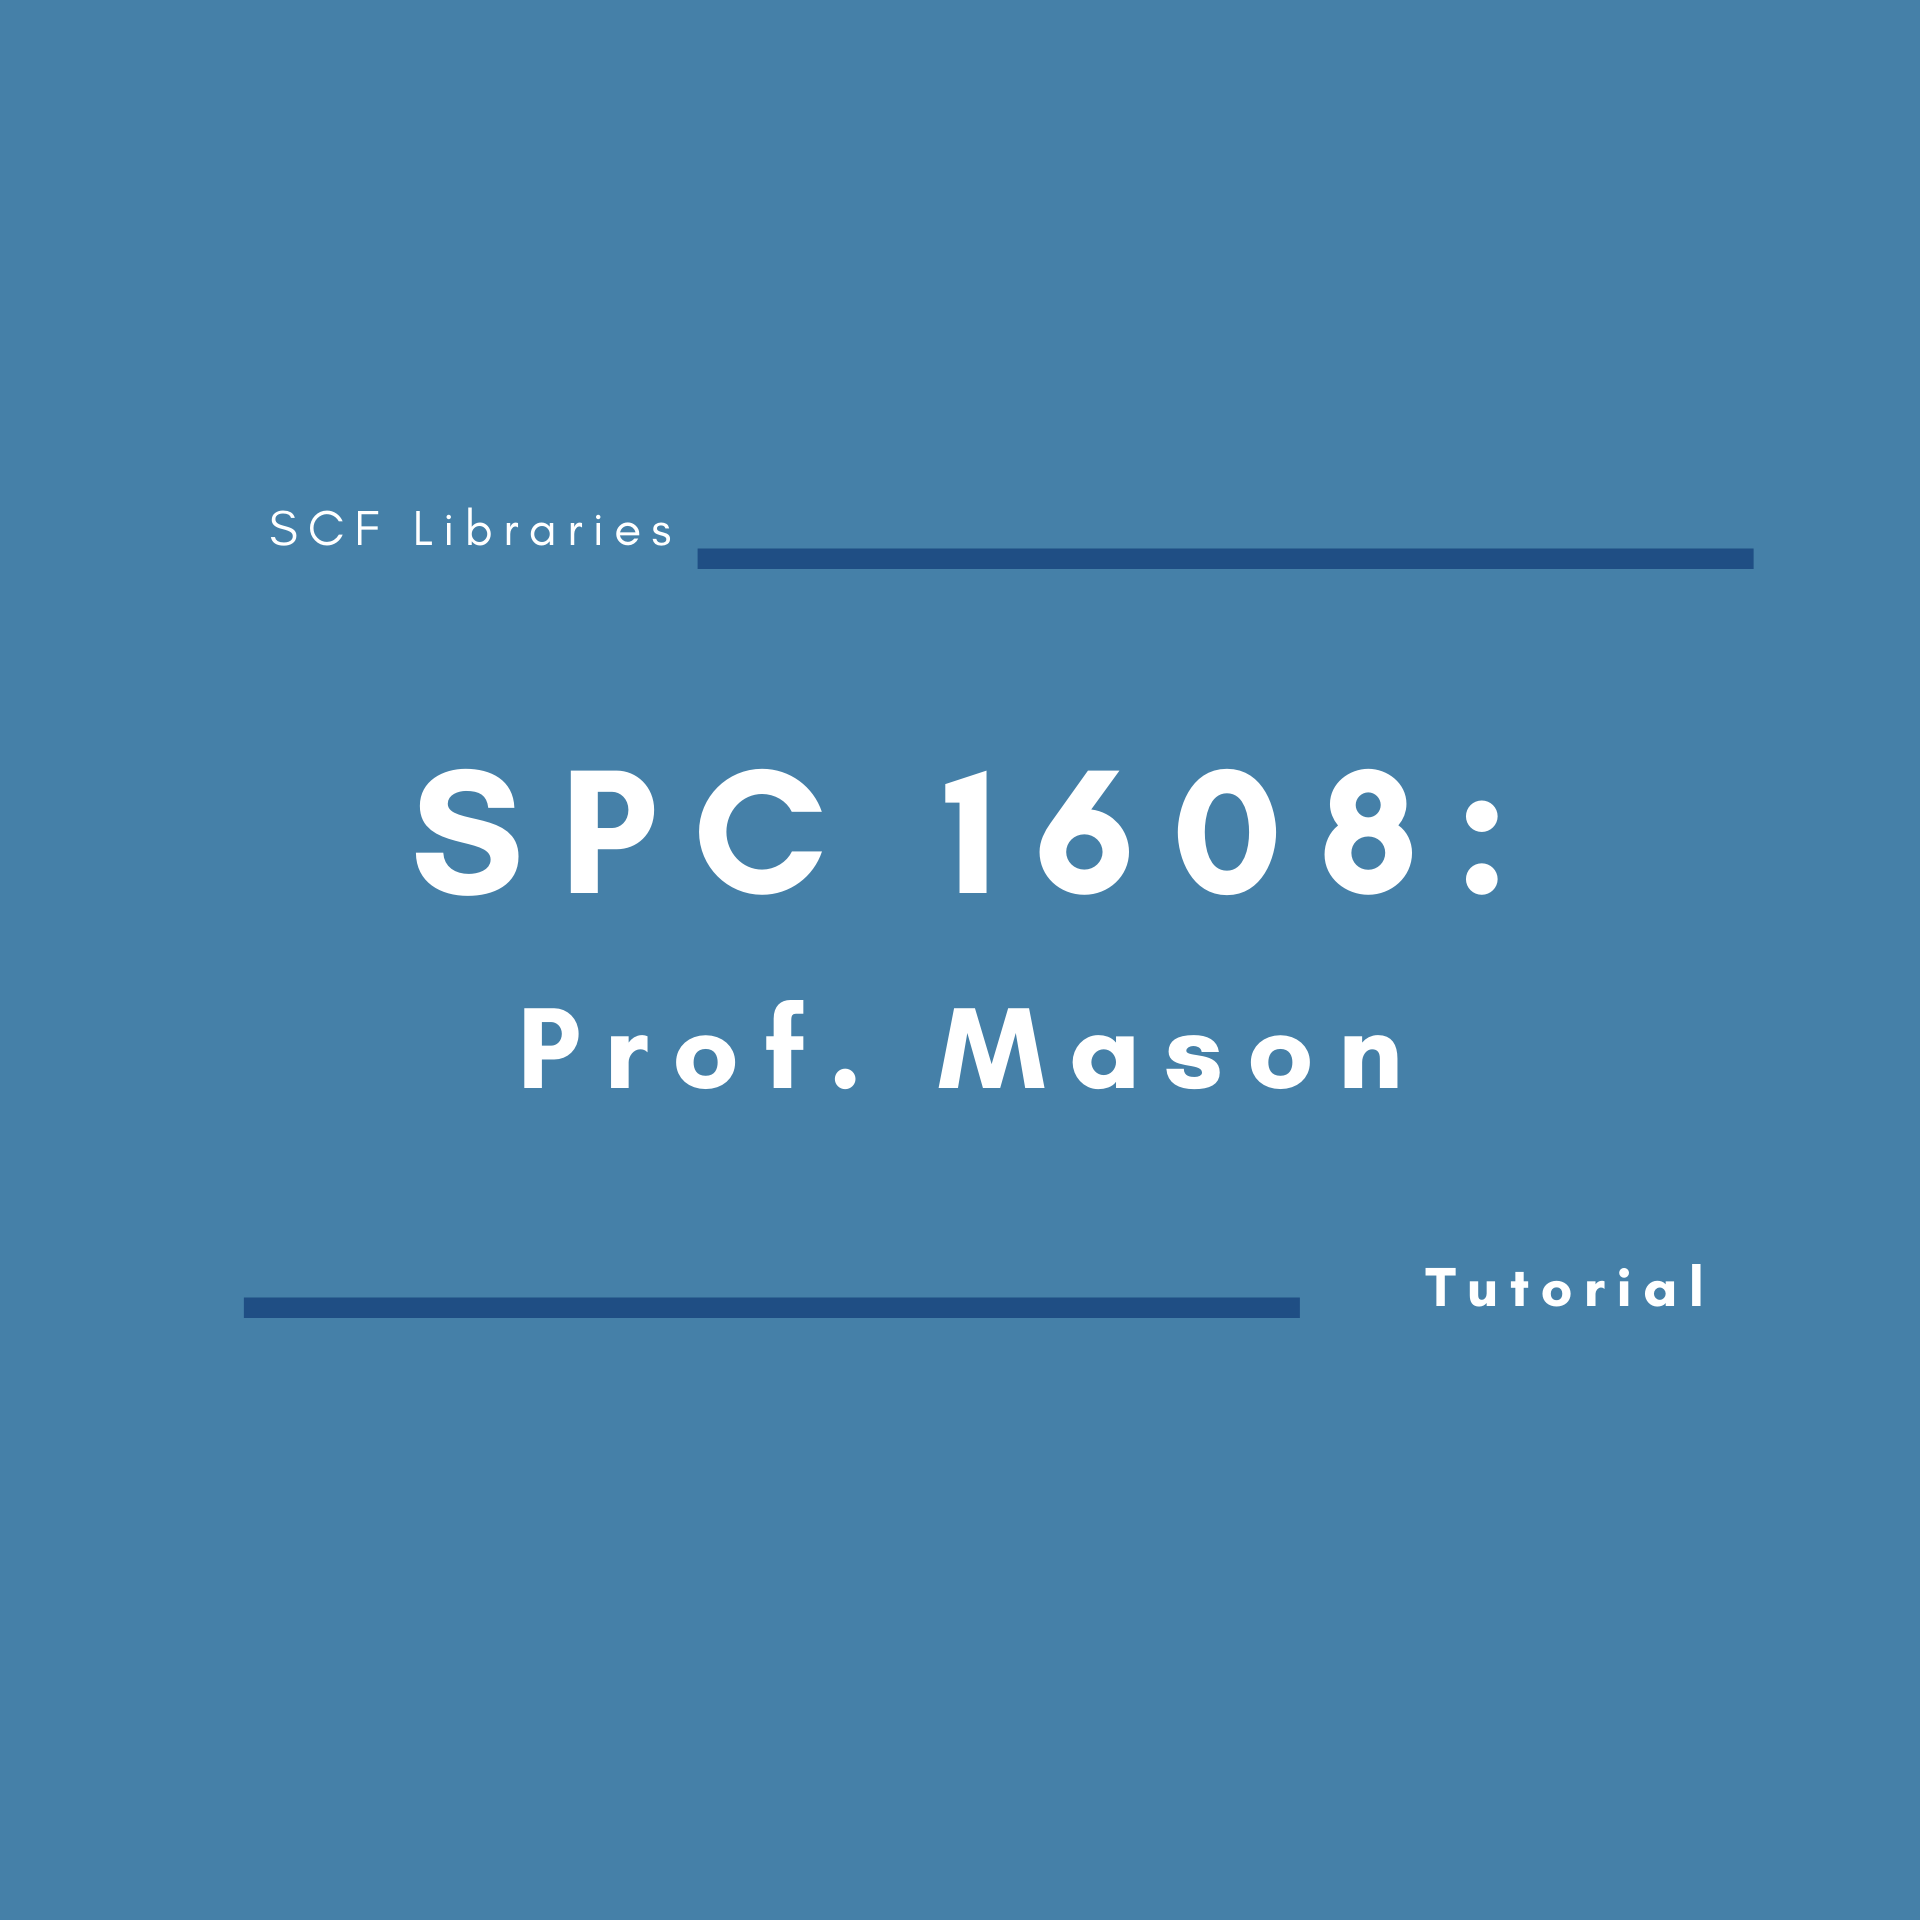 Tutorial. SPC 1608: Prof. Mason